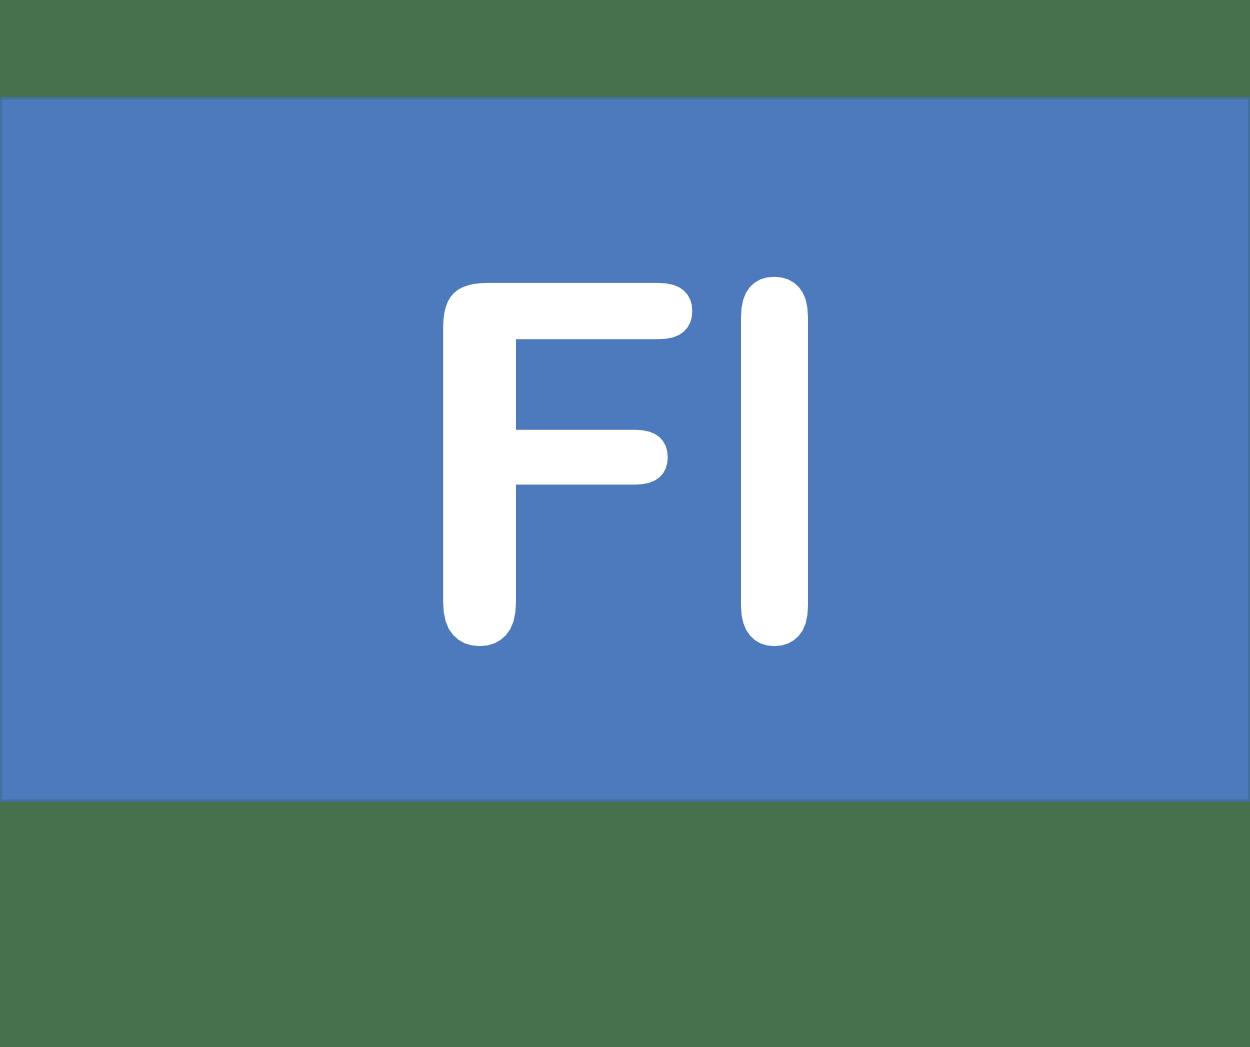 114 Fl フレロビウム Flerovium 元素 記号 周期表 化学 原子